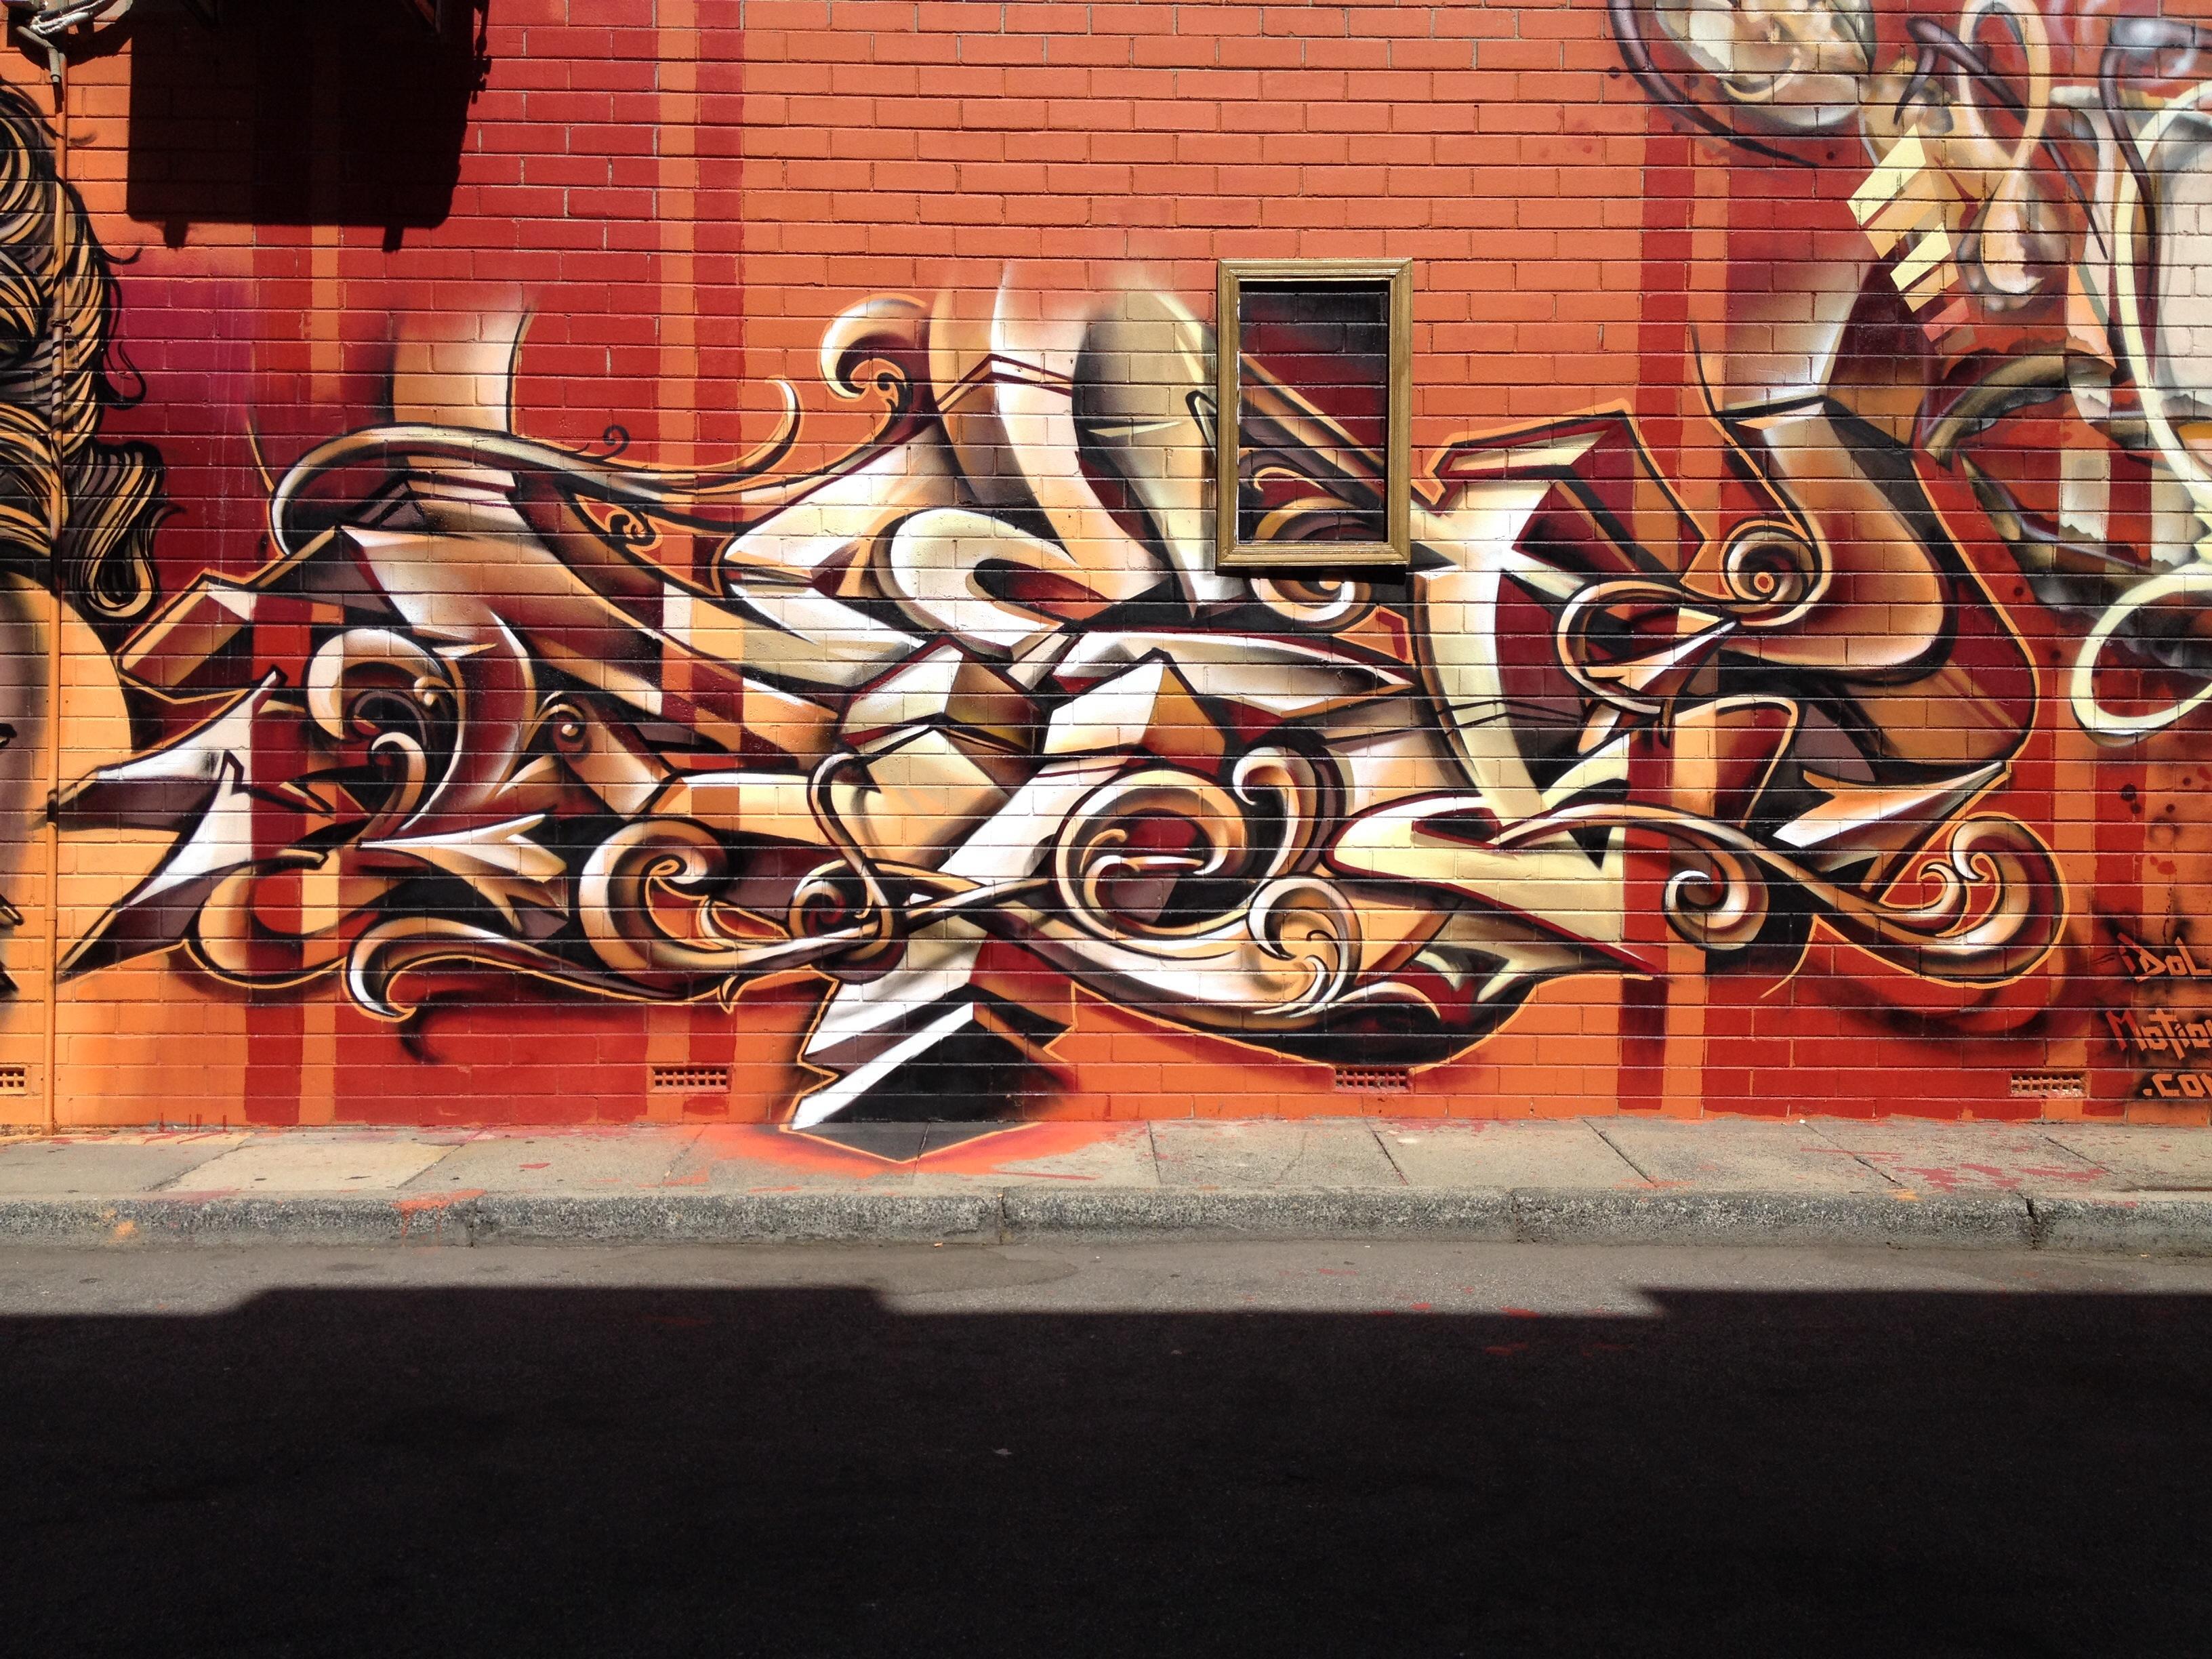 Graffiti street art australia mural perth art aerosol modern art font dest visual arts